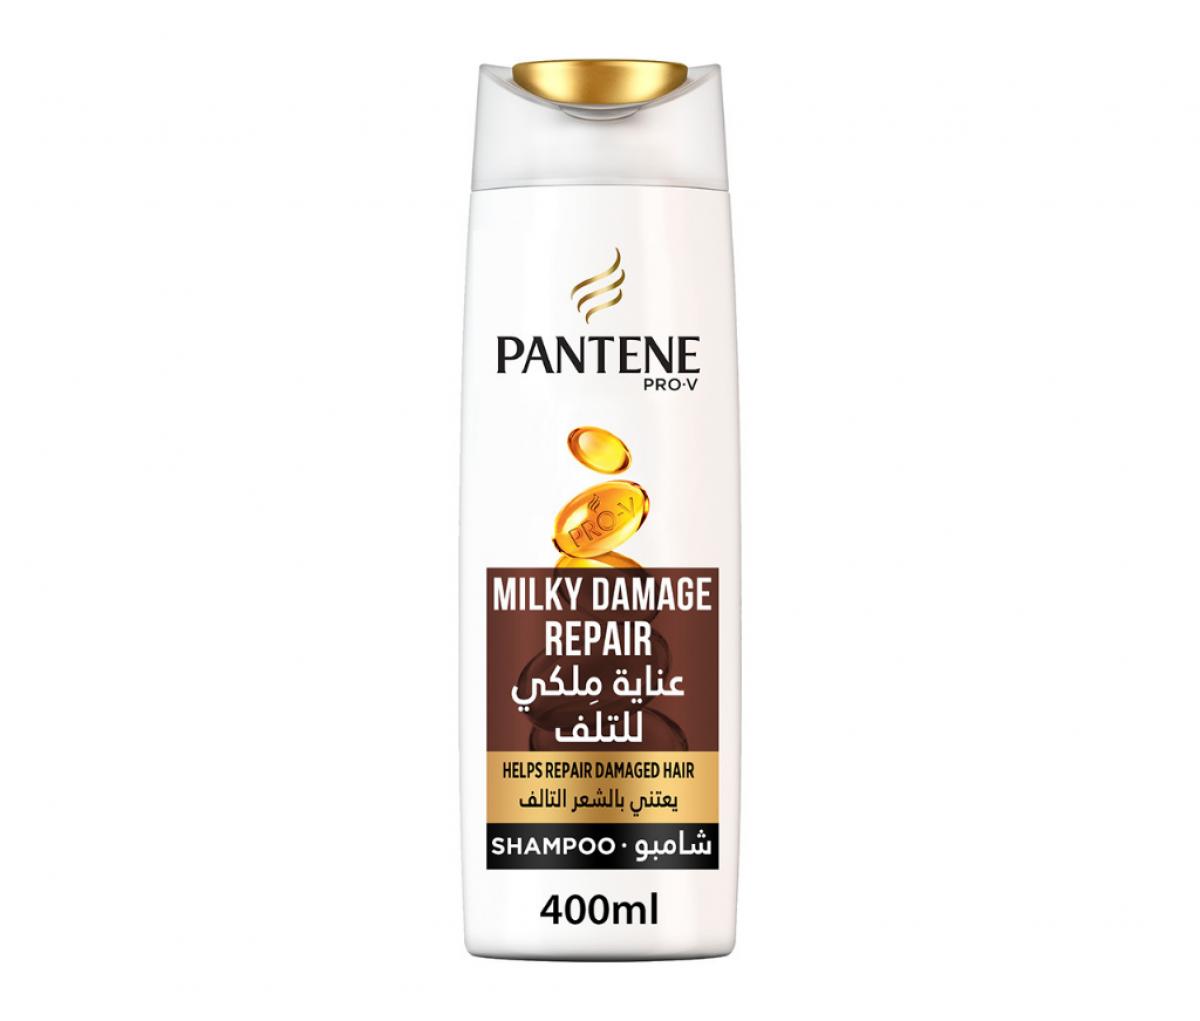 Pantene Shampoo 400ml Milky Damage Repair